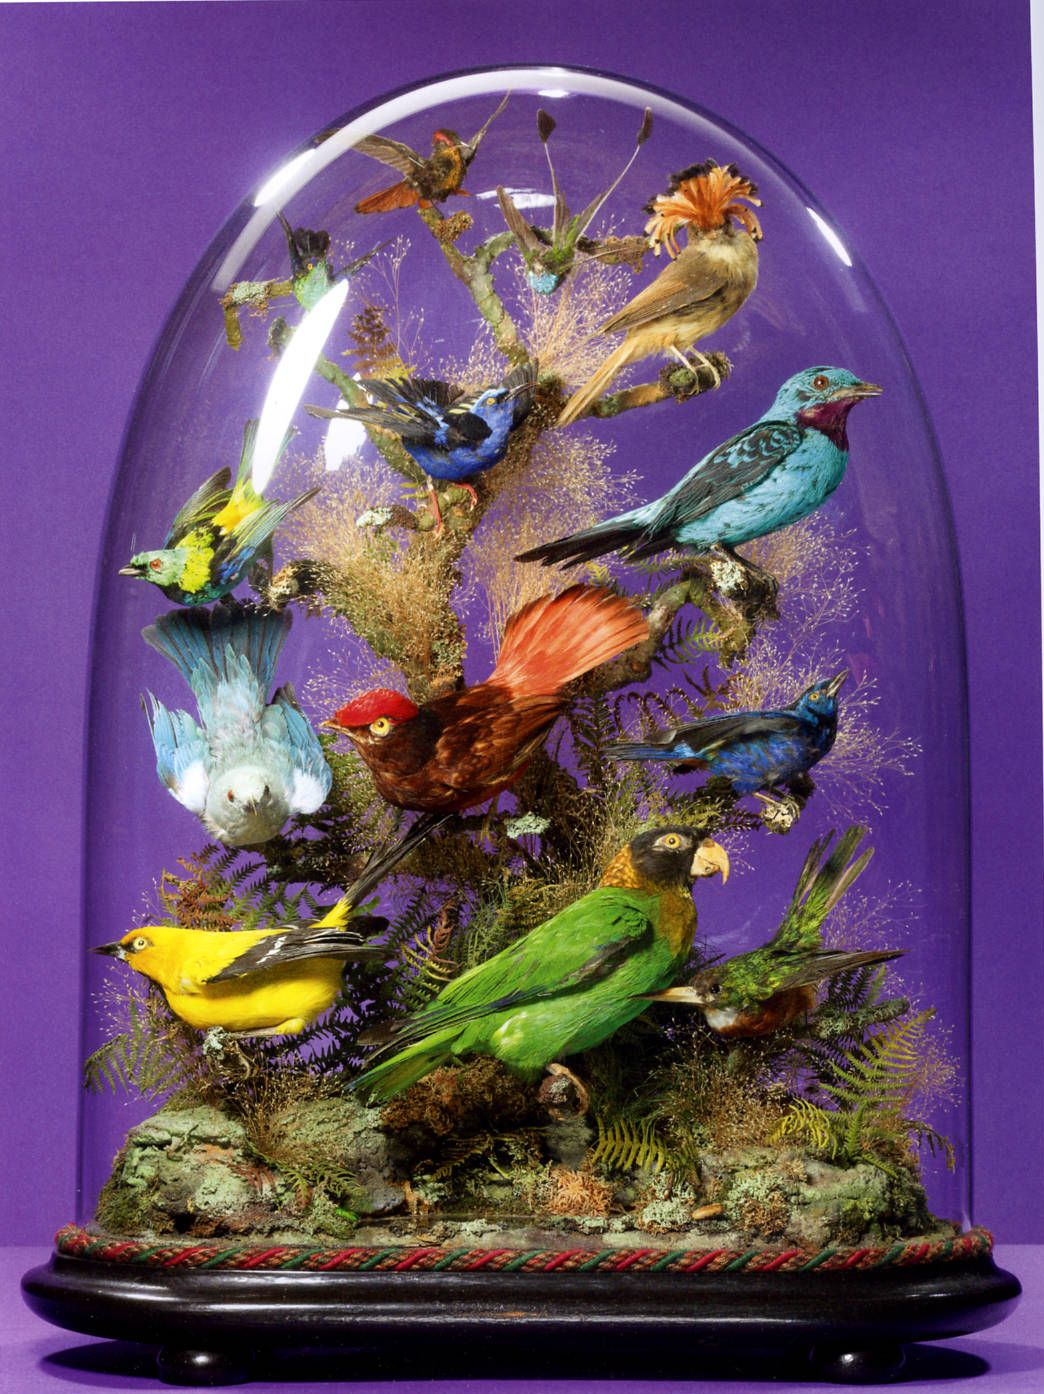 Beauties in bell jars a review of john whitenightus